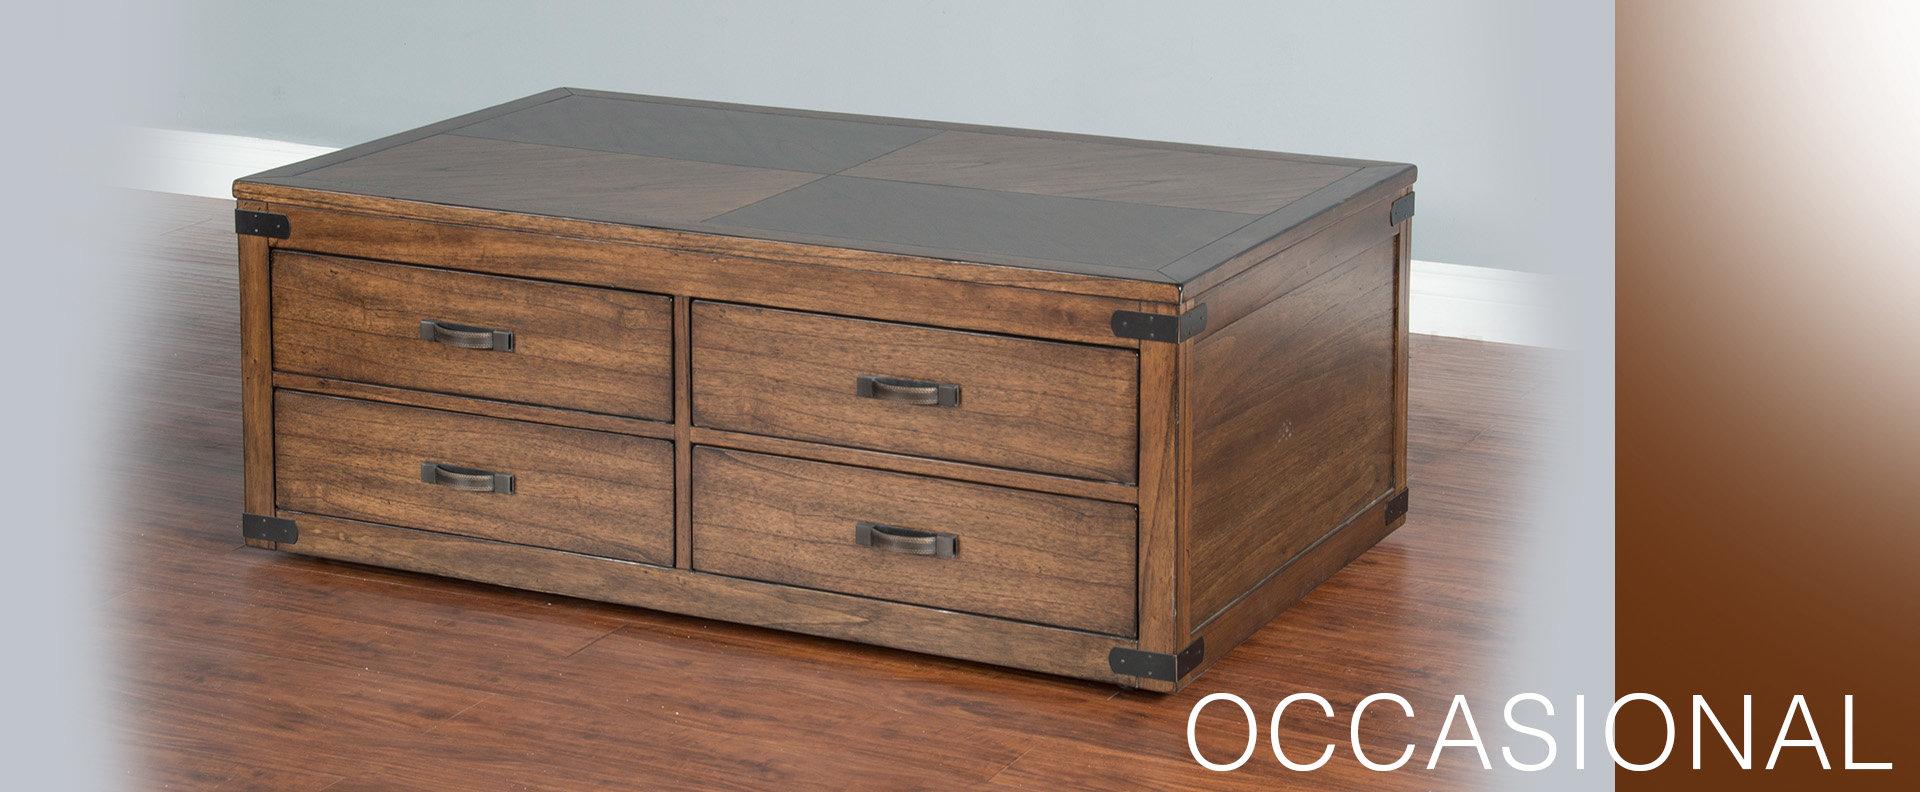 3299NW-OCC SL3